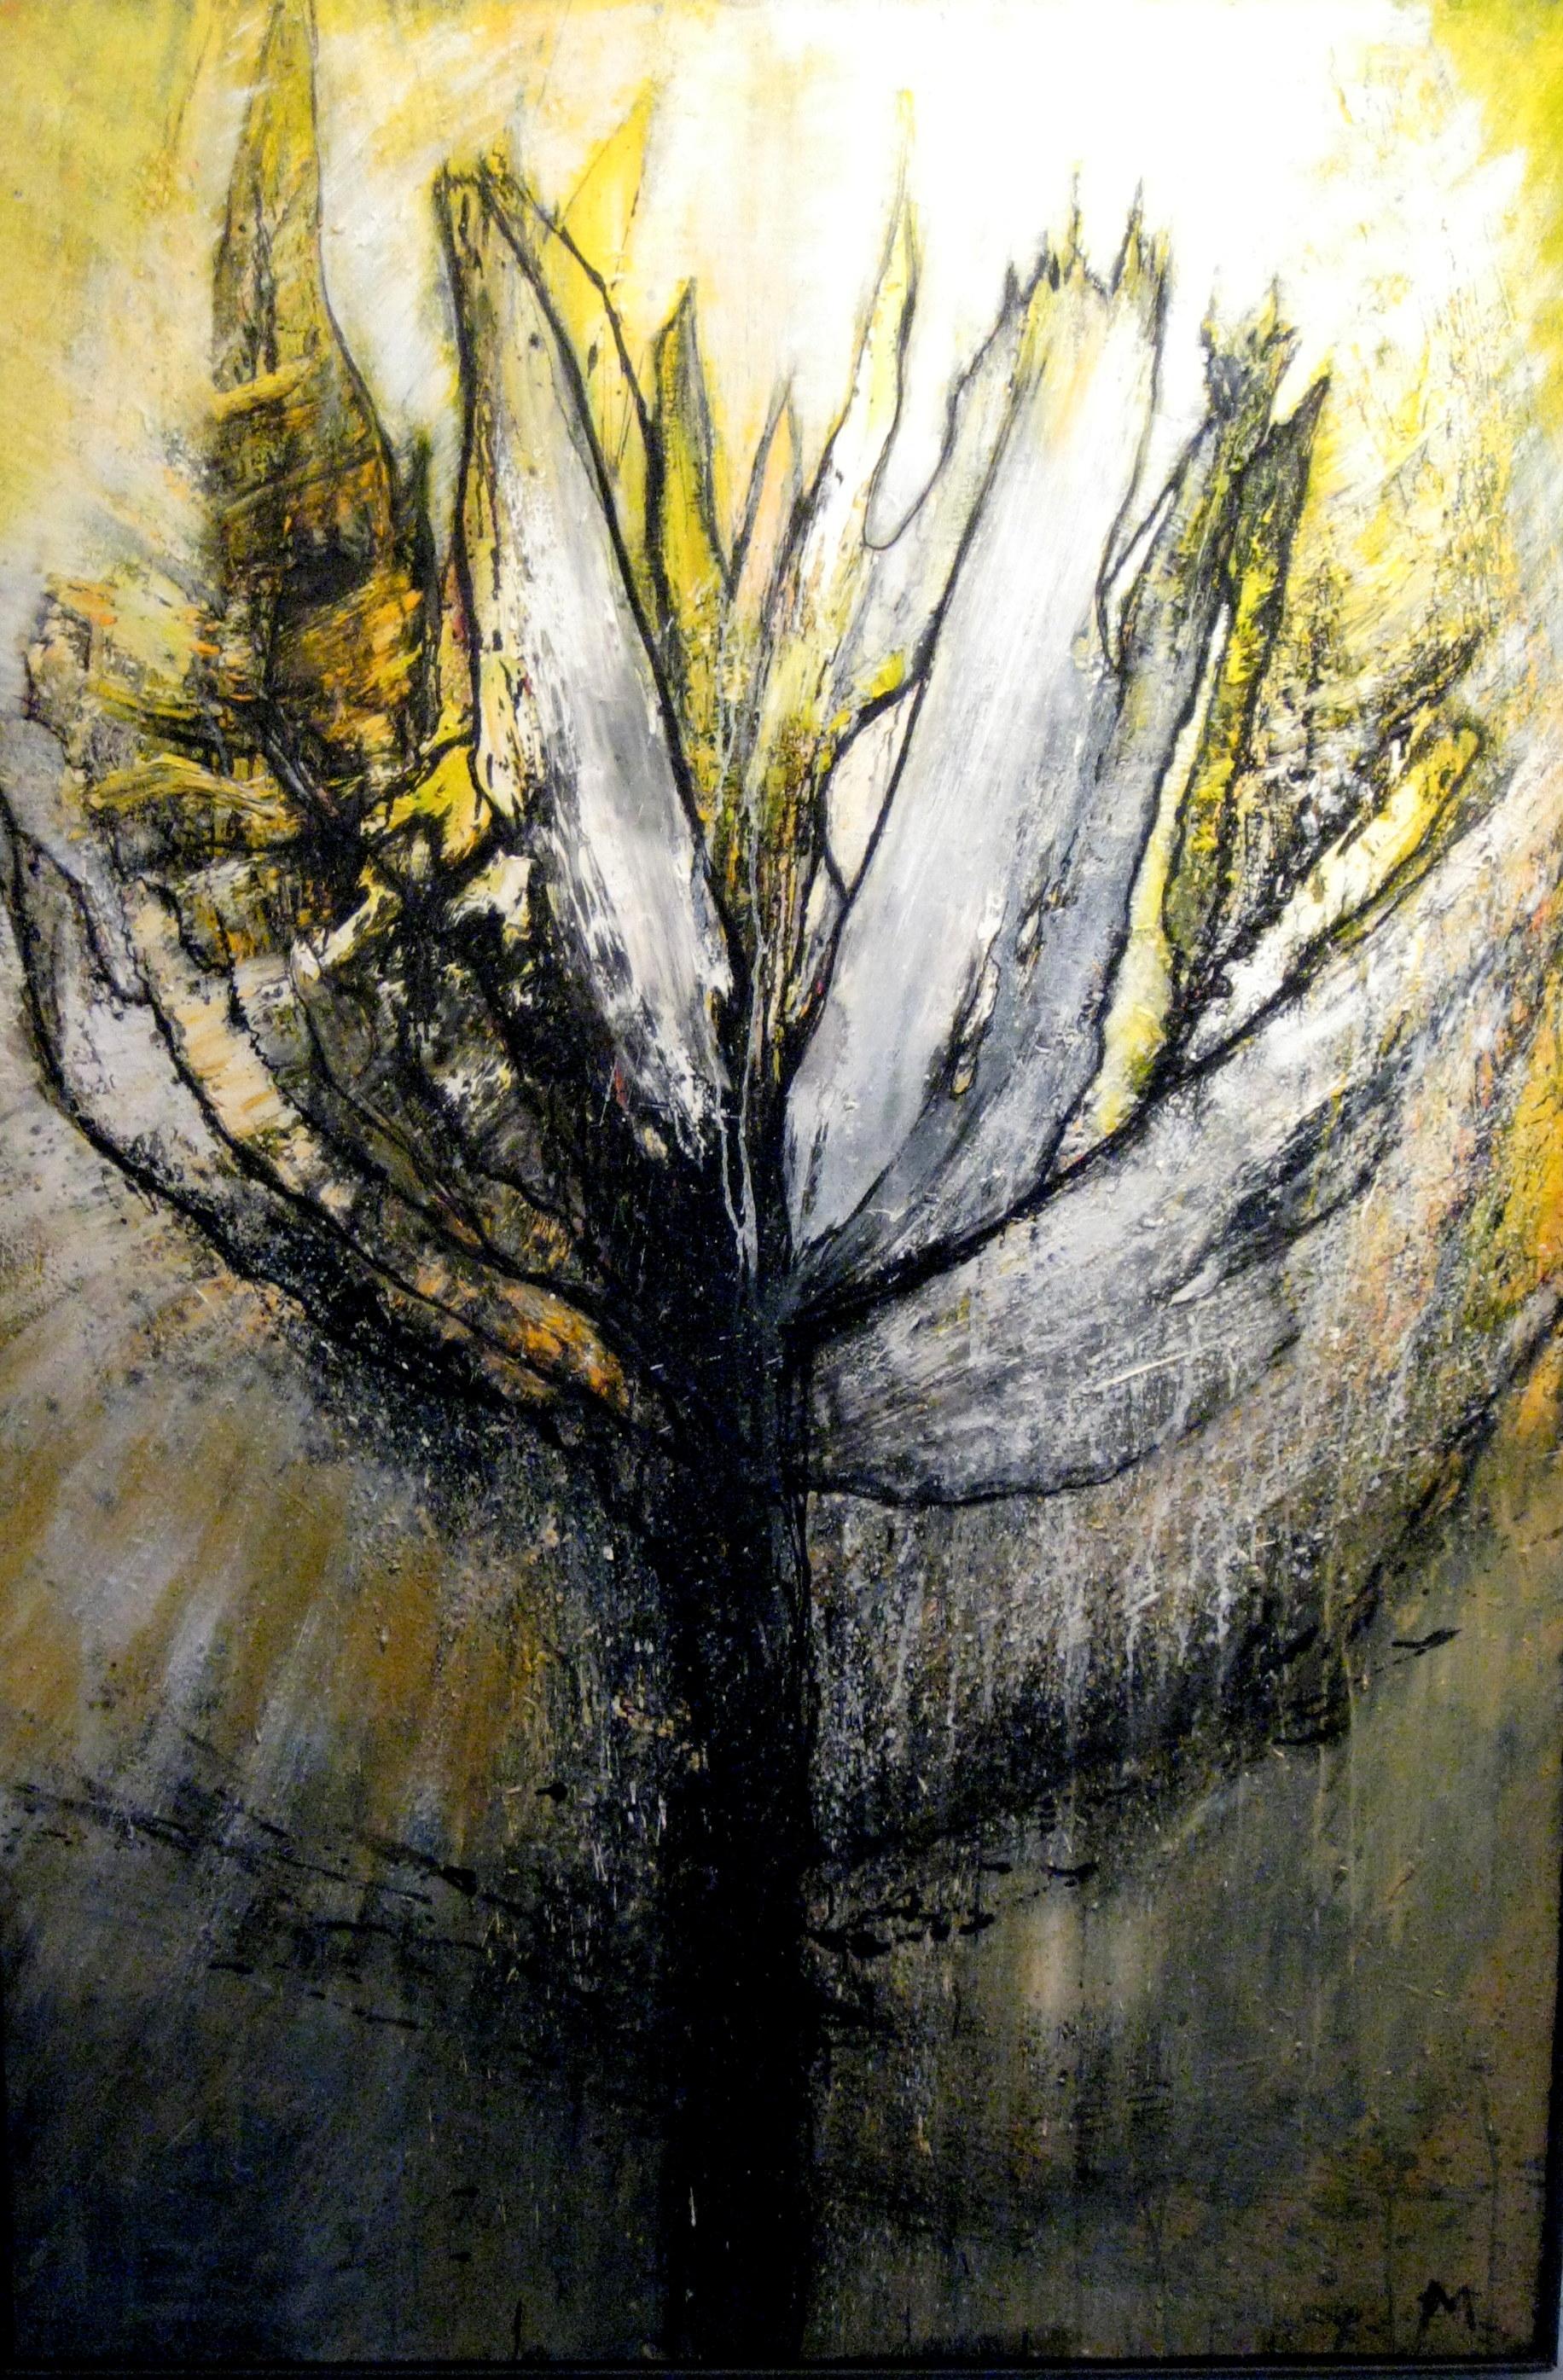 Creation by Leonard Meiselman